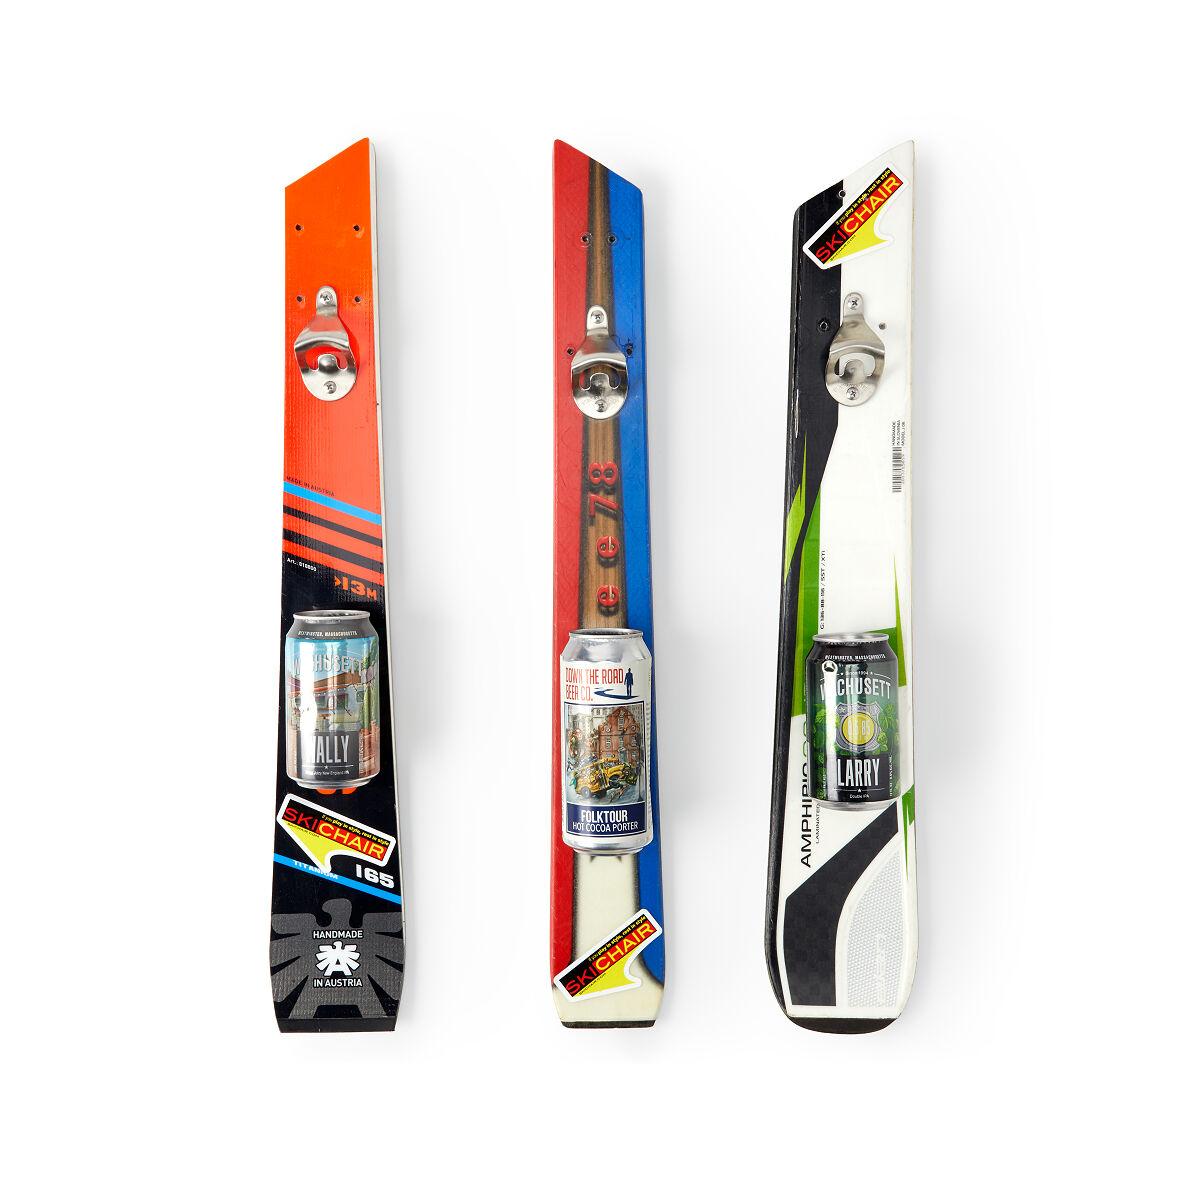 Wall Mounted Recycled Ski Bottle Opener Ski Gifts Ski